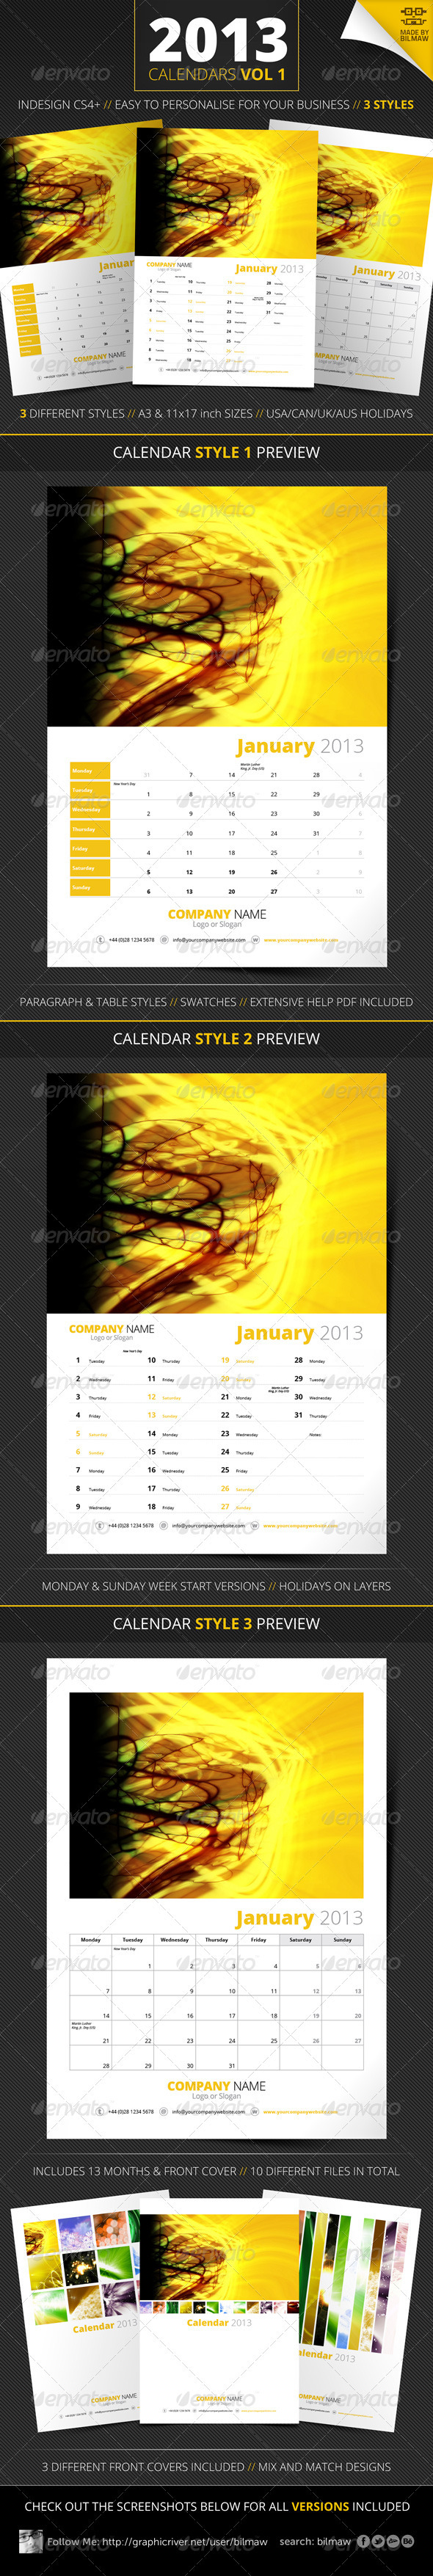 GraphicRiver 2013 Calendars Vol 1 3229977